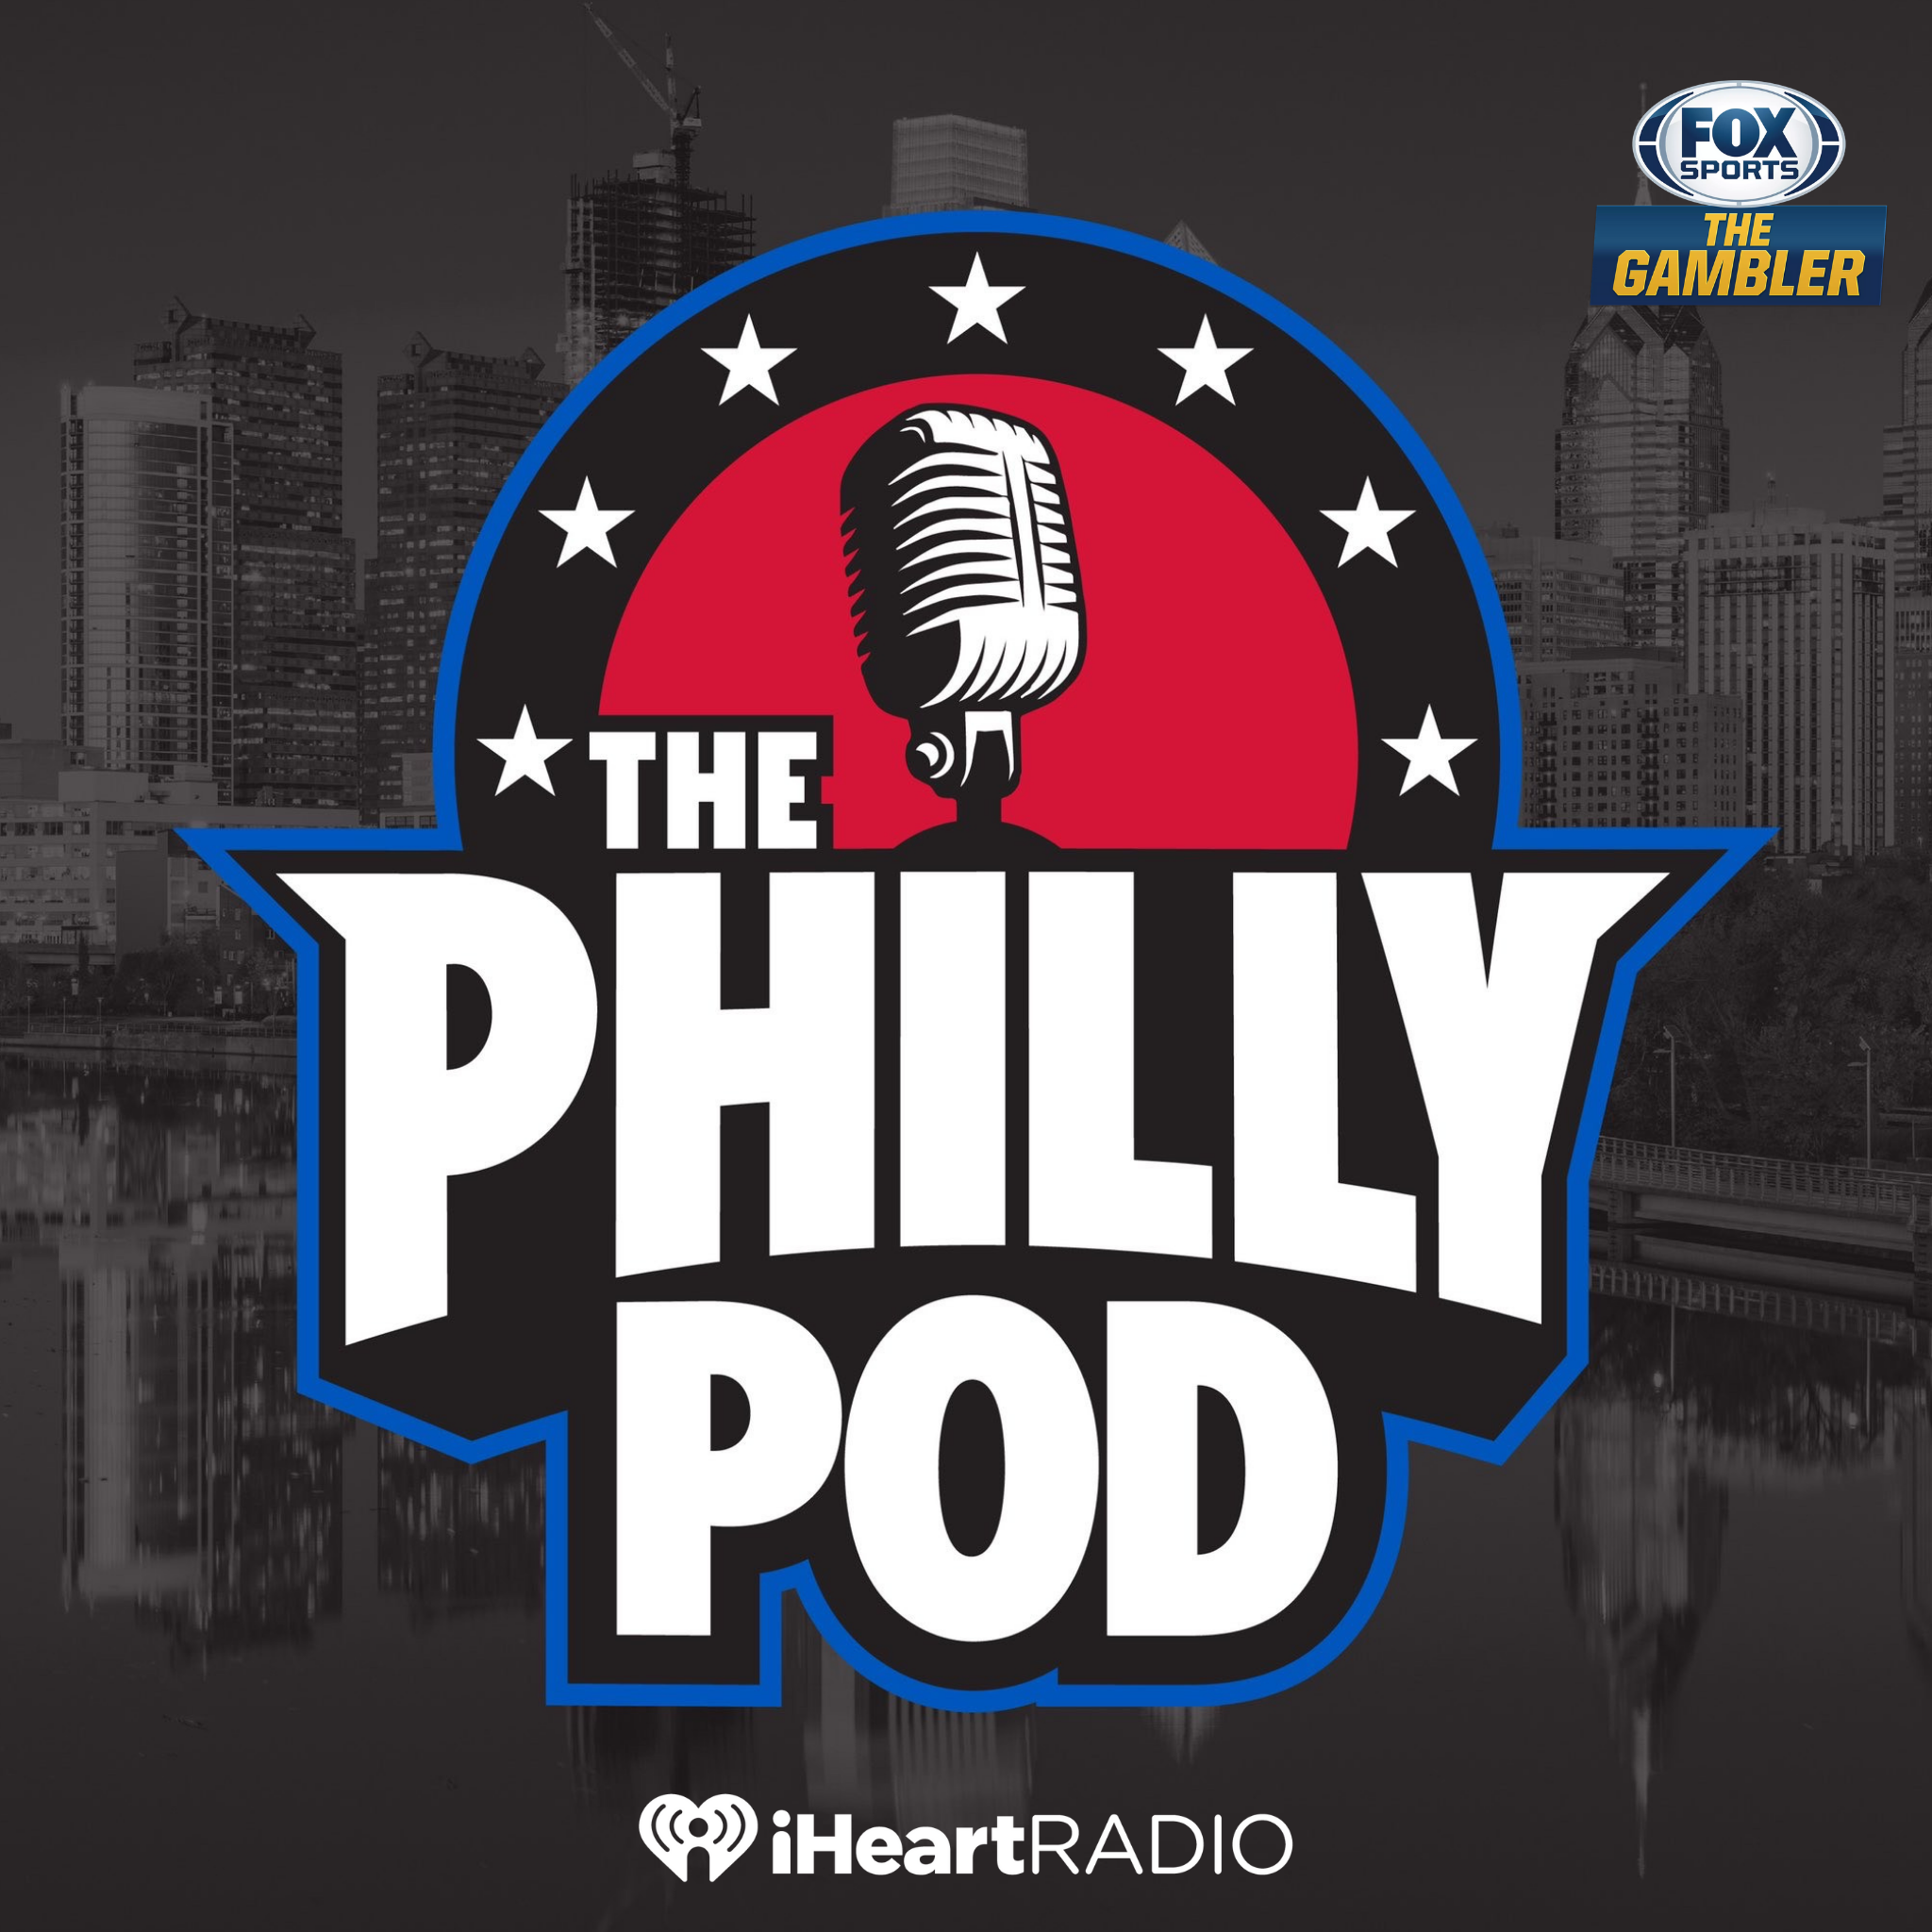 Artwork for podcast The Philly Pod: A Philadelphia Eagles Podcast